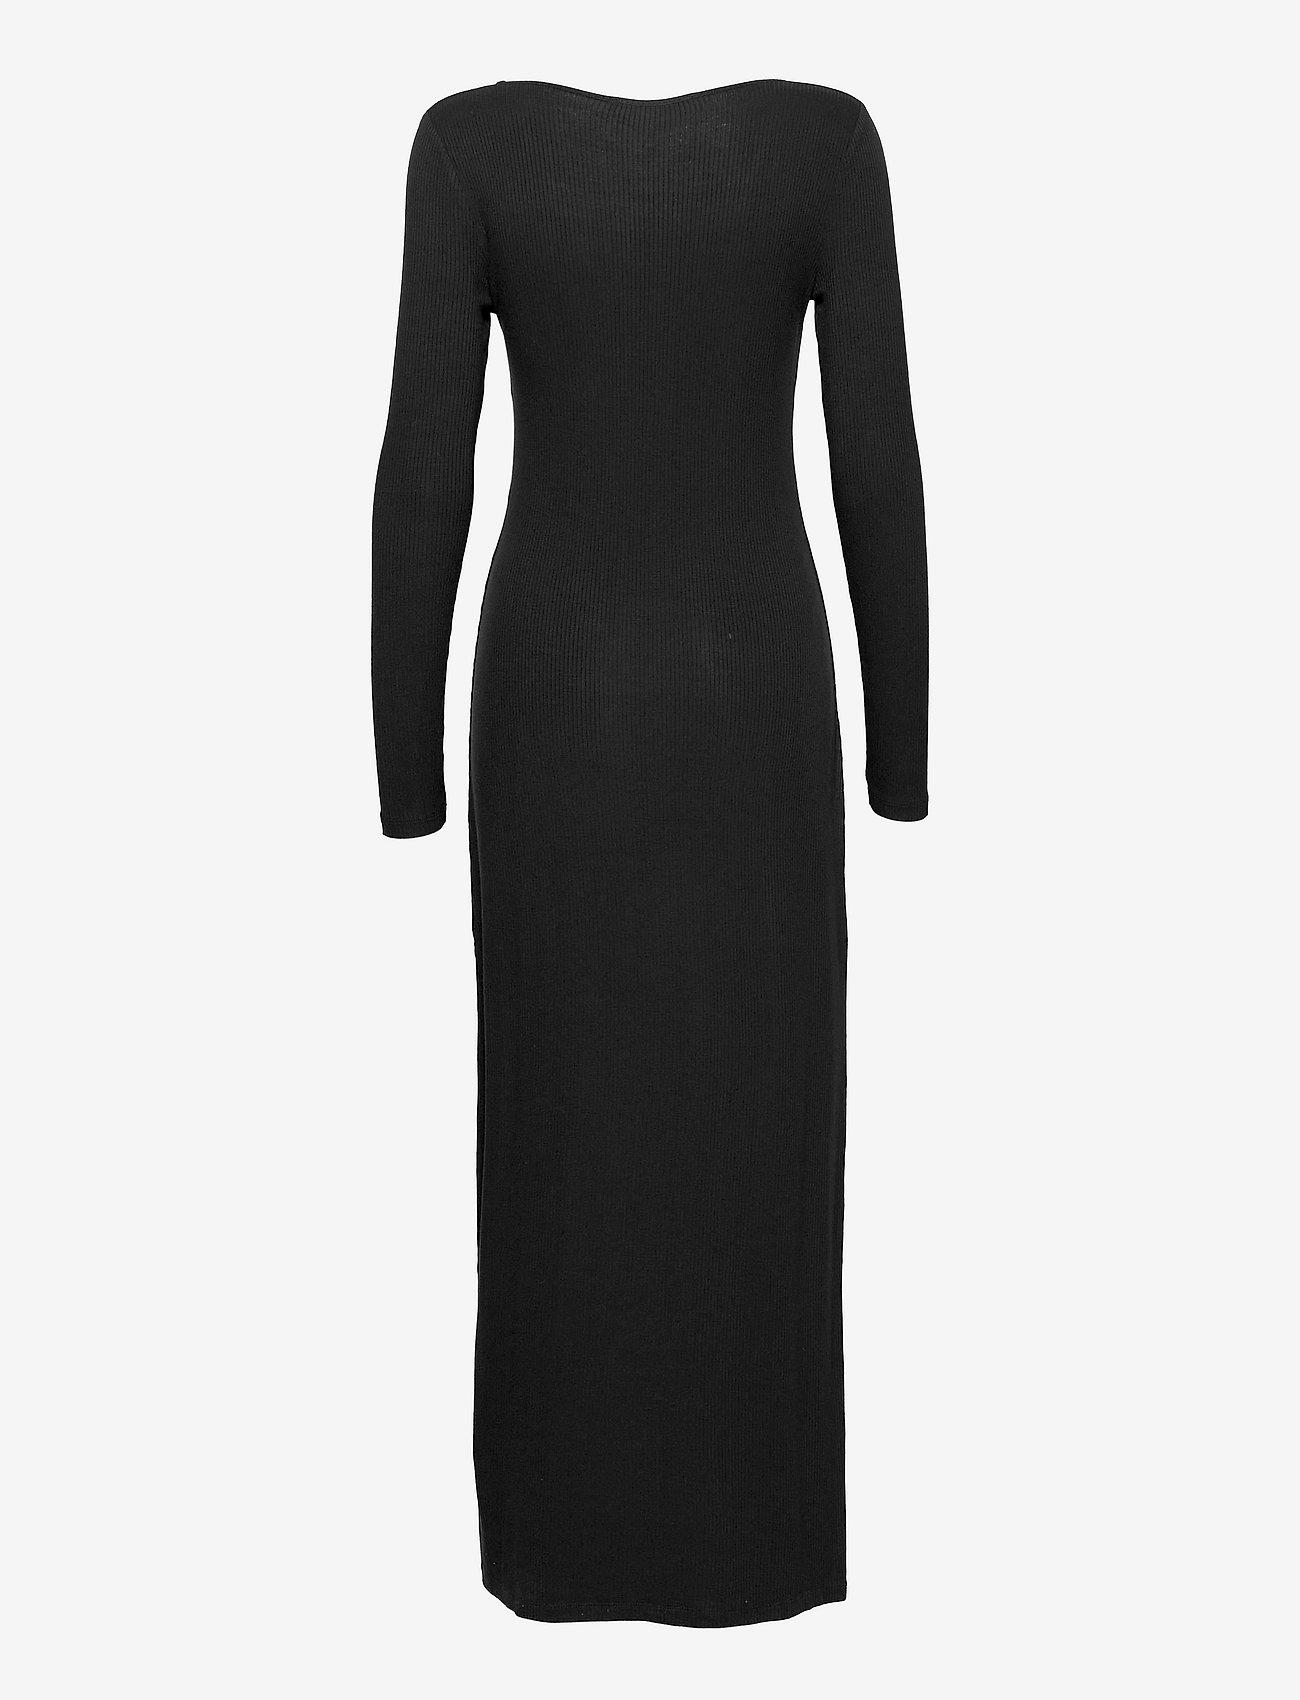 Samsøe Samsøe - Patty long dress 14119 - kveldskjoler - black - 1